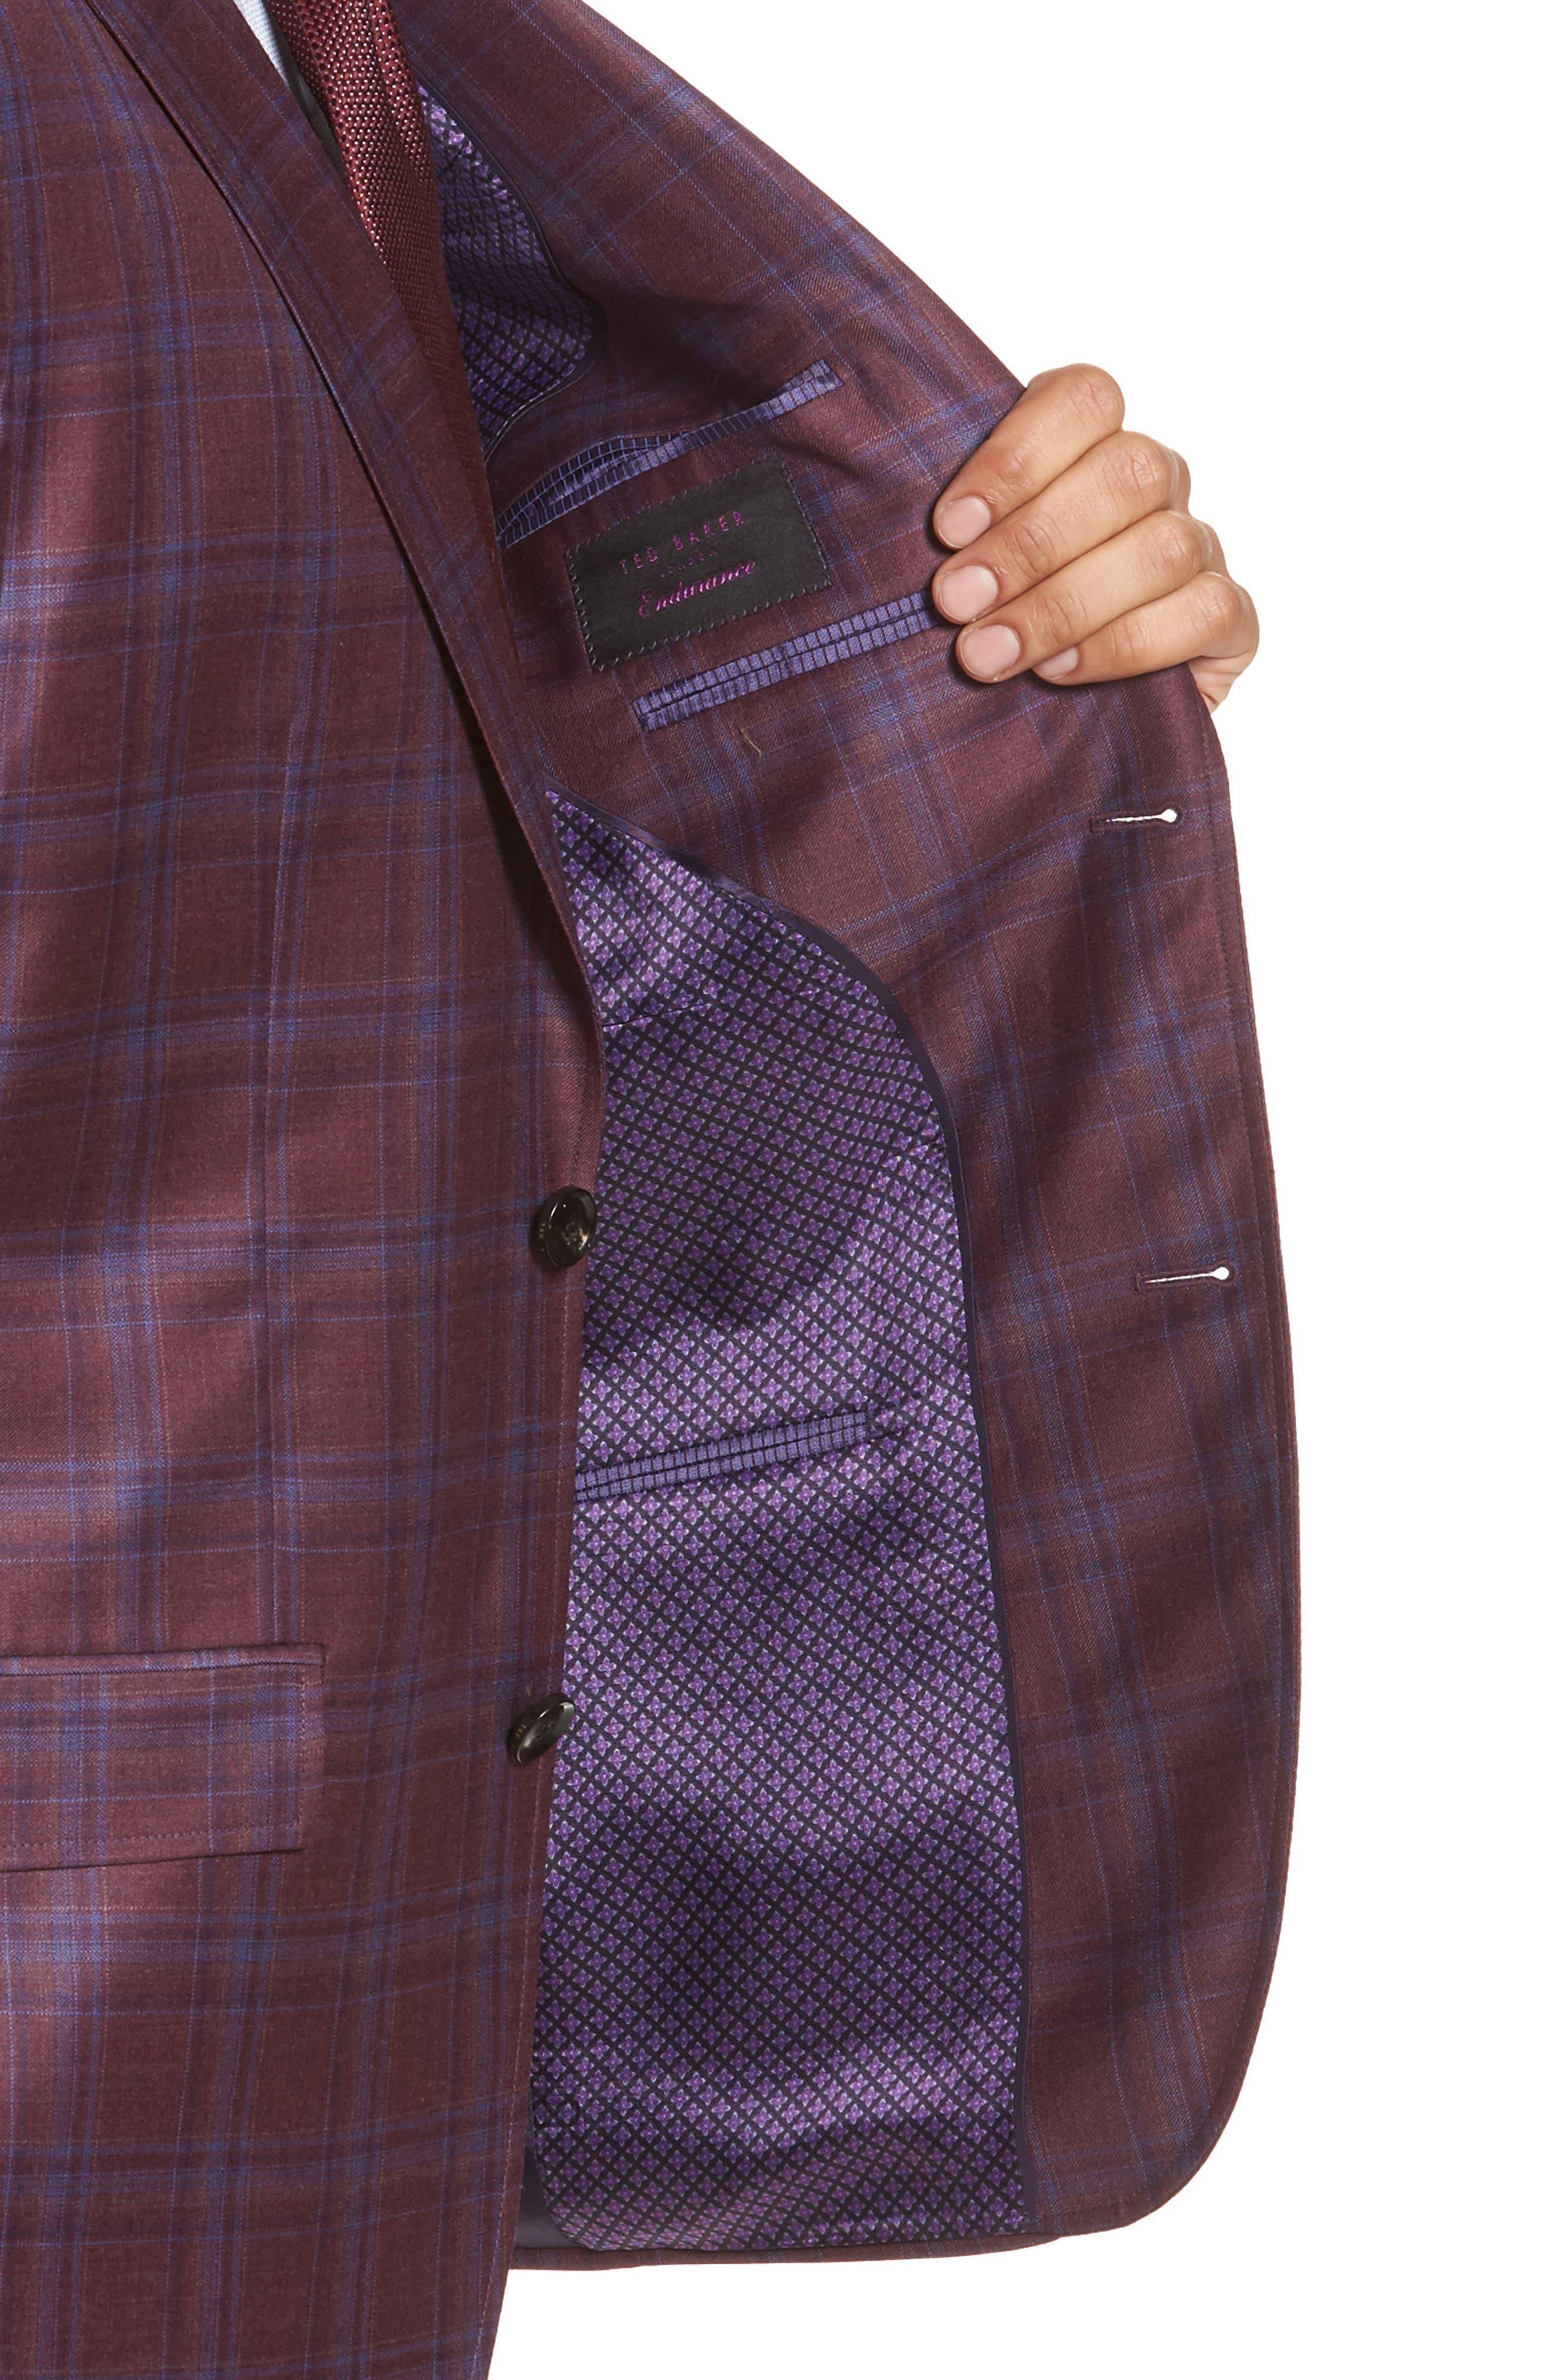 Jay Trim Fit Plaid Wool Sport Coat,                             Alternate thumbnail 4, color,                             Red